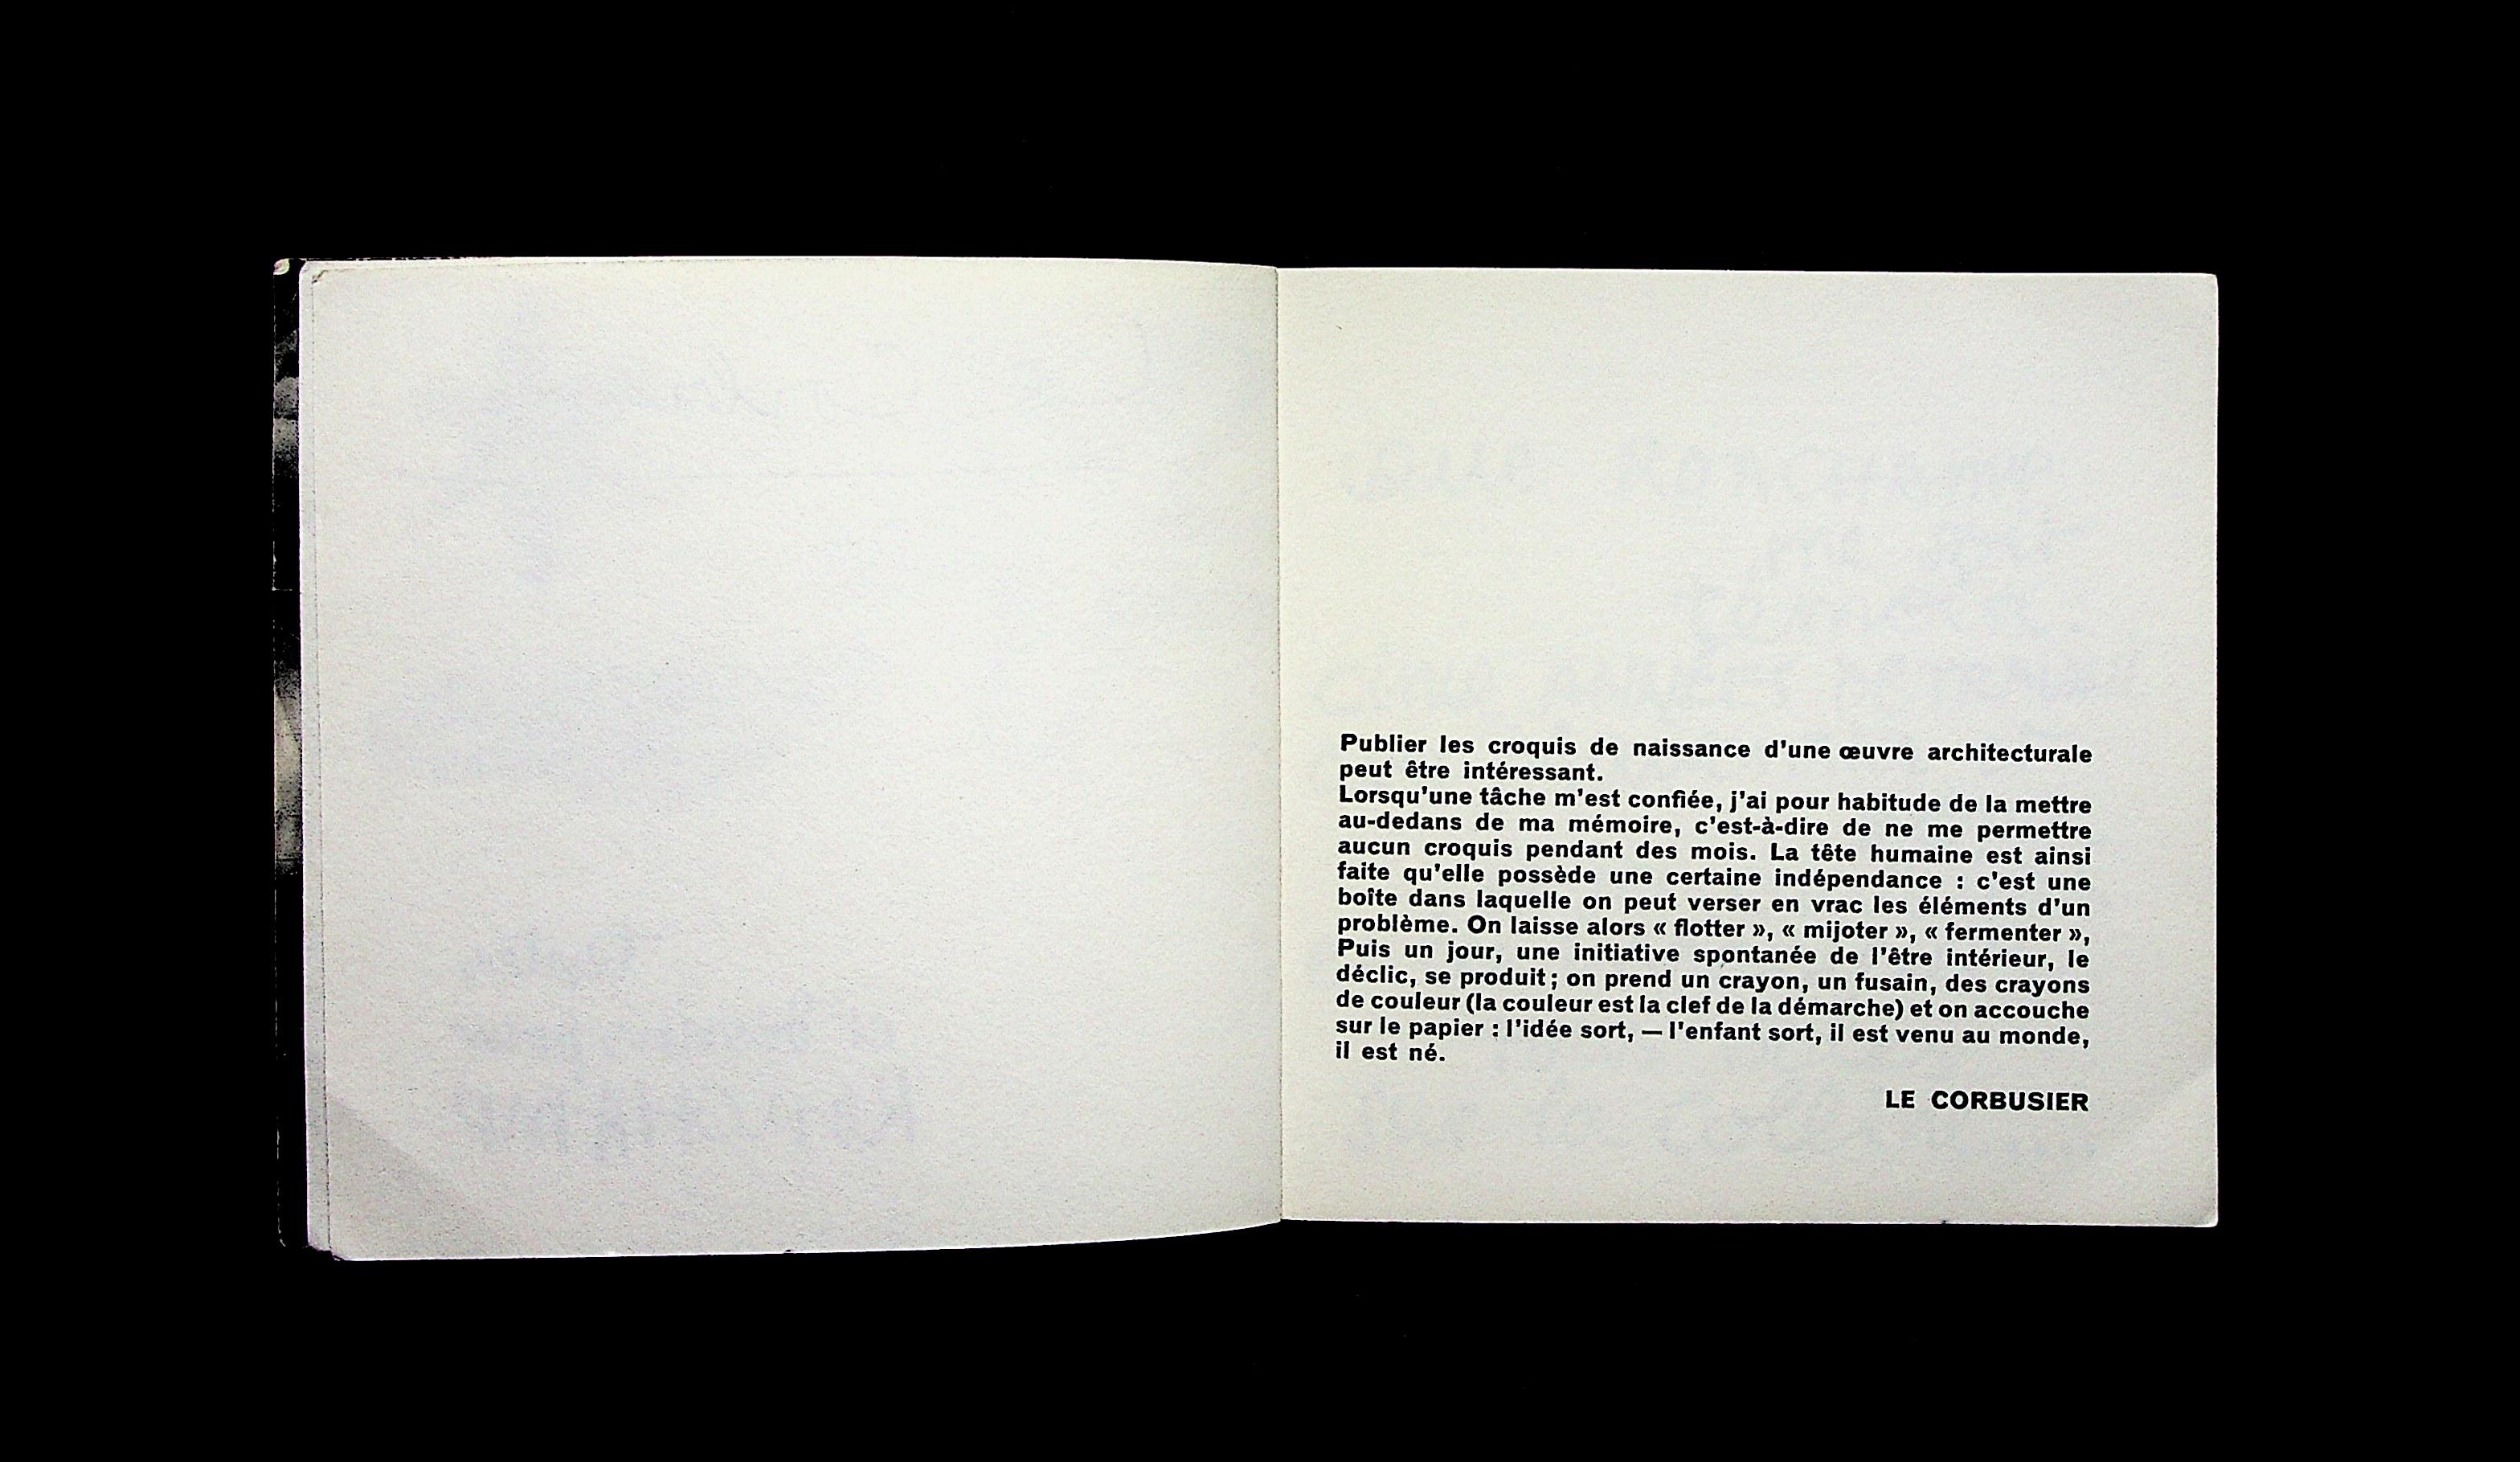 Corbusier Textes_4